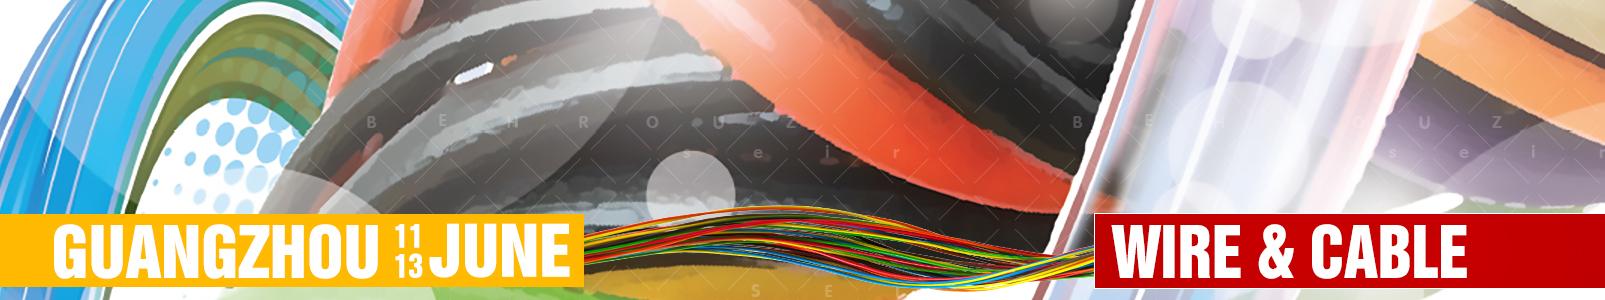 Wire-&-Cable-Guoangzhu-Header-بهروزسیر